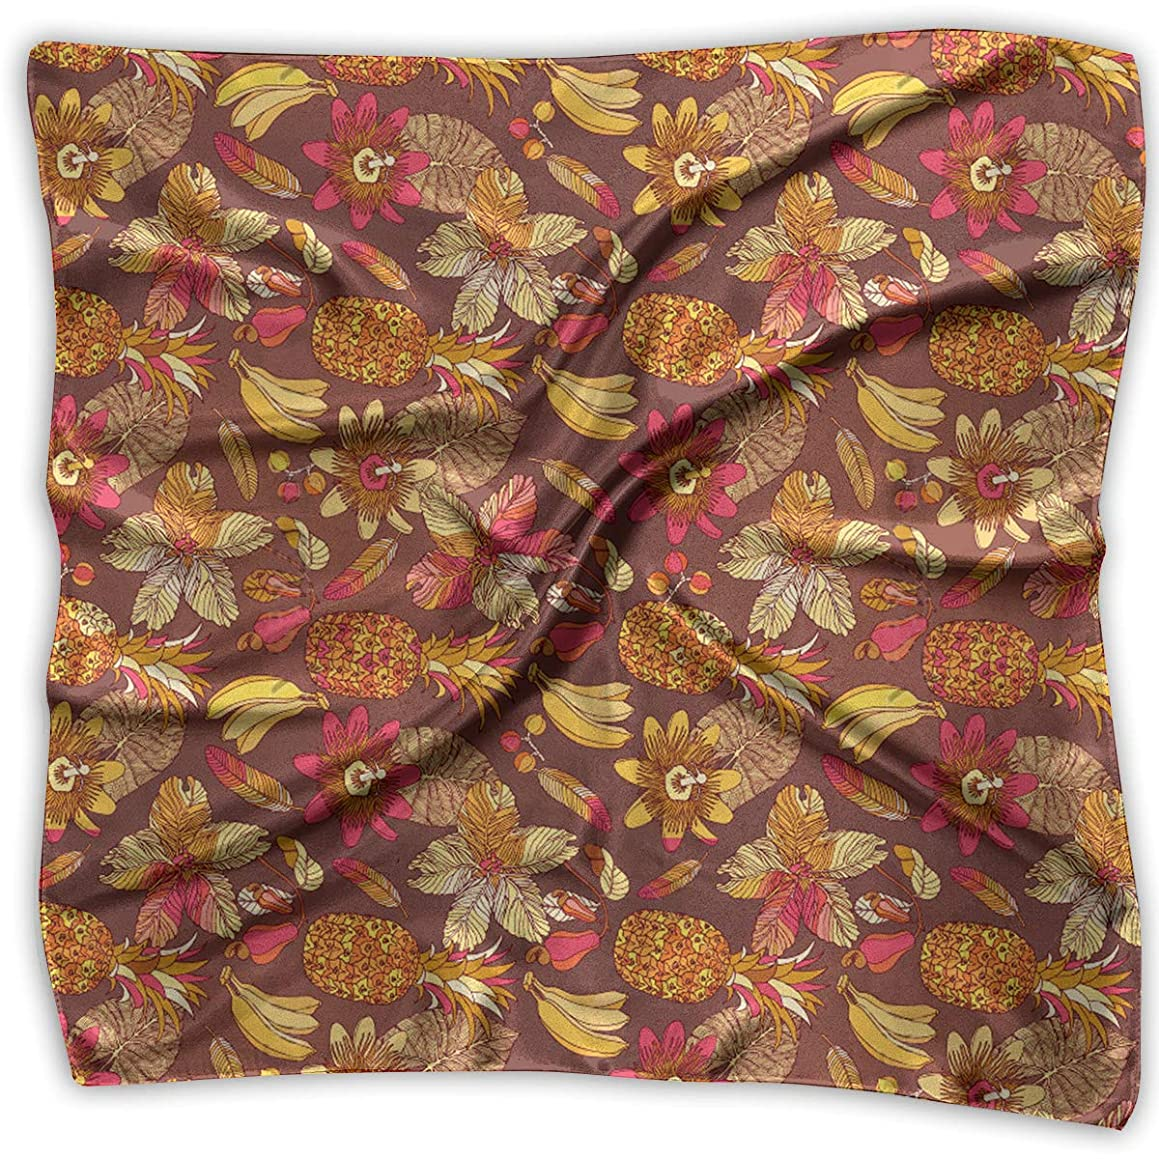 Square Satin Scarf Hibiscus Tropical Flowers Pineapple Silk Like Lightweight Bandanas Head Wrap Neck Shawl Headscarf